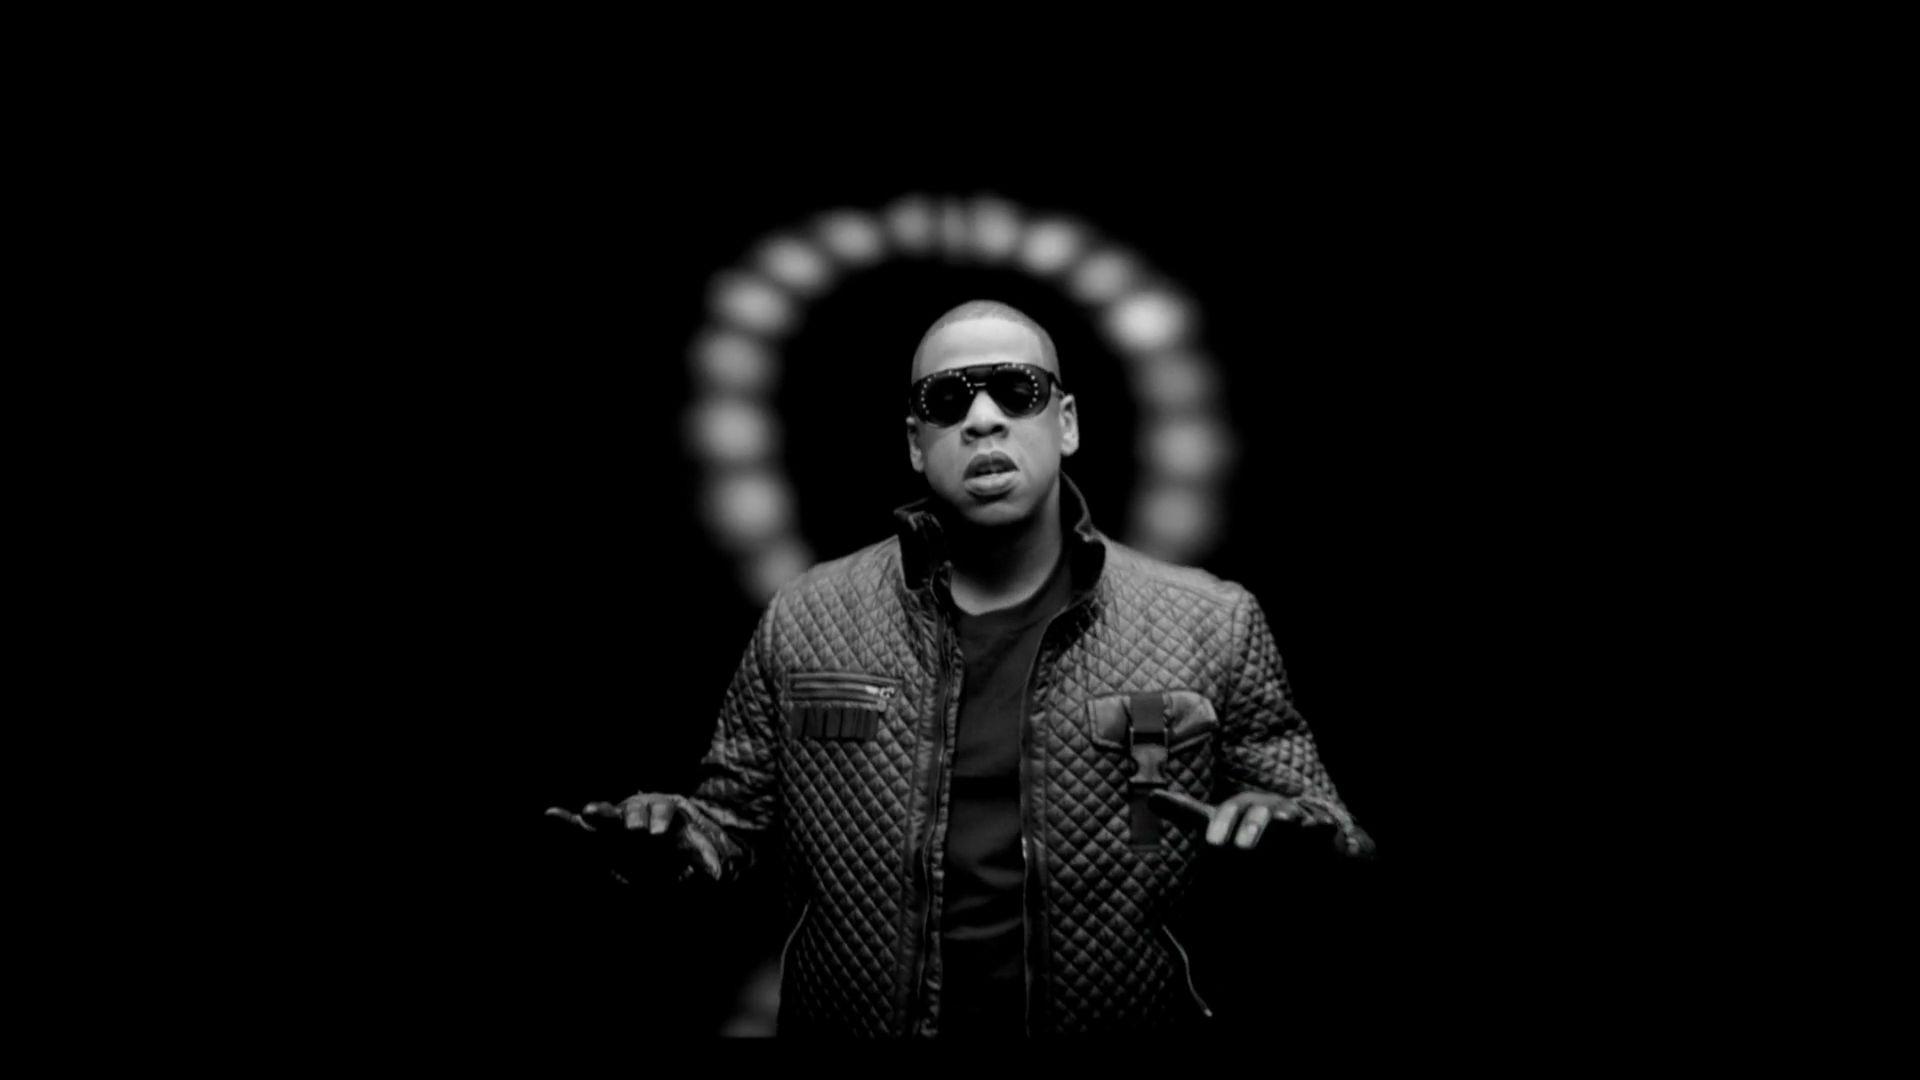 Jay Z wallpaper photo